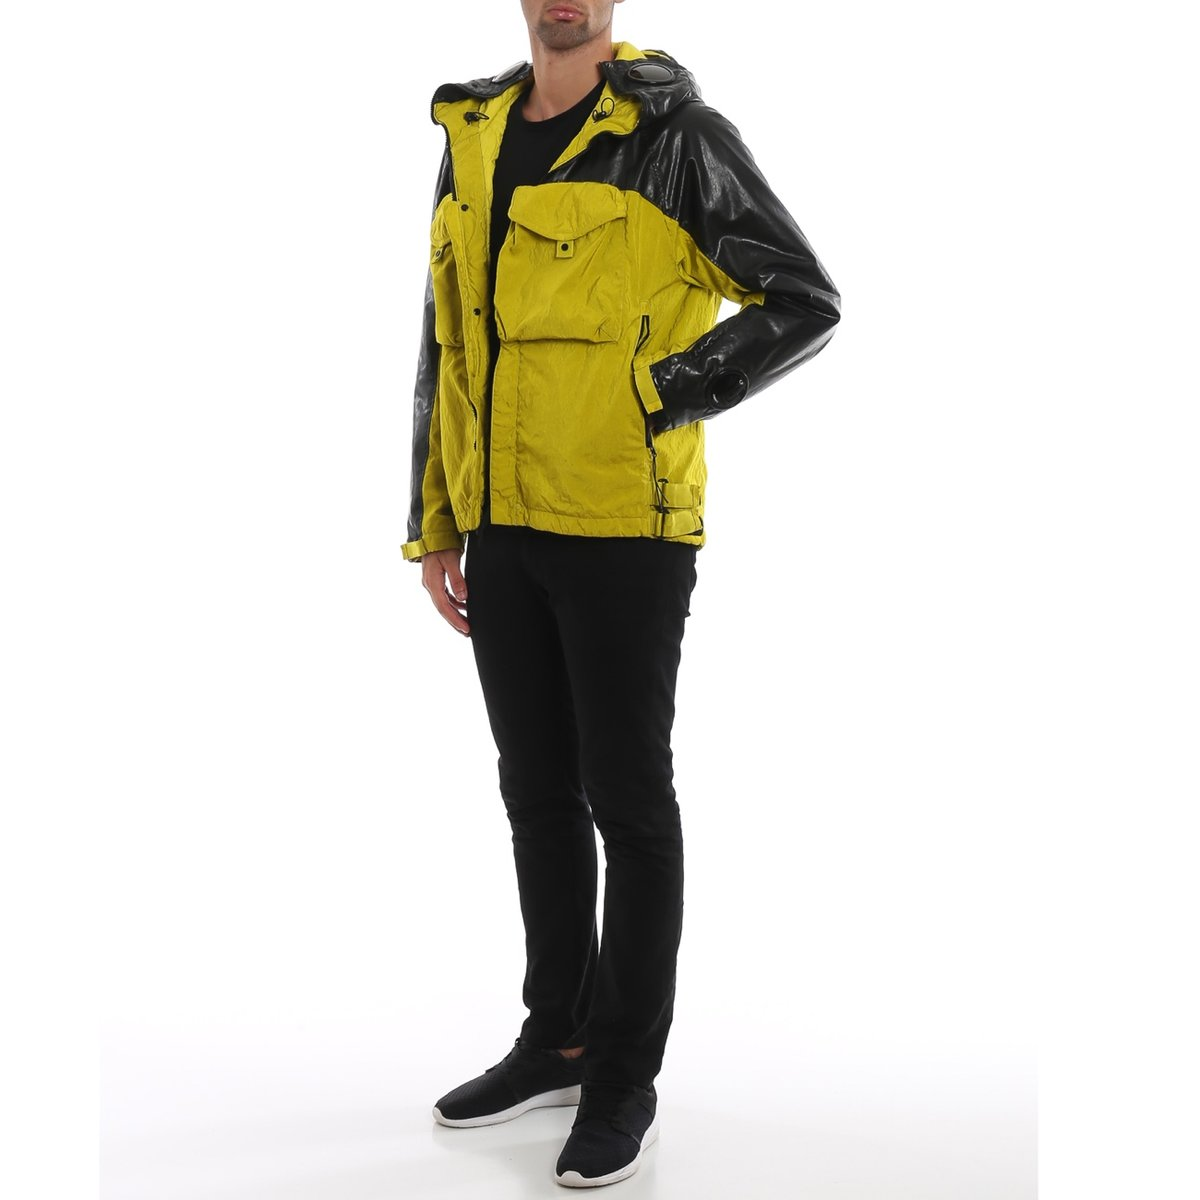 c.p.-company-online-padded-jackets-la-mille-quartz-goggle-padded-jacket-00000171748f00s002.jpg